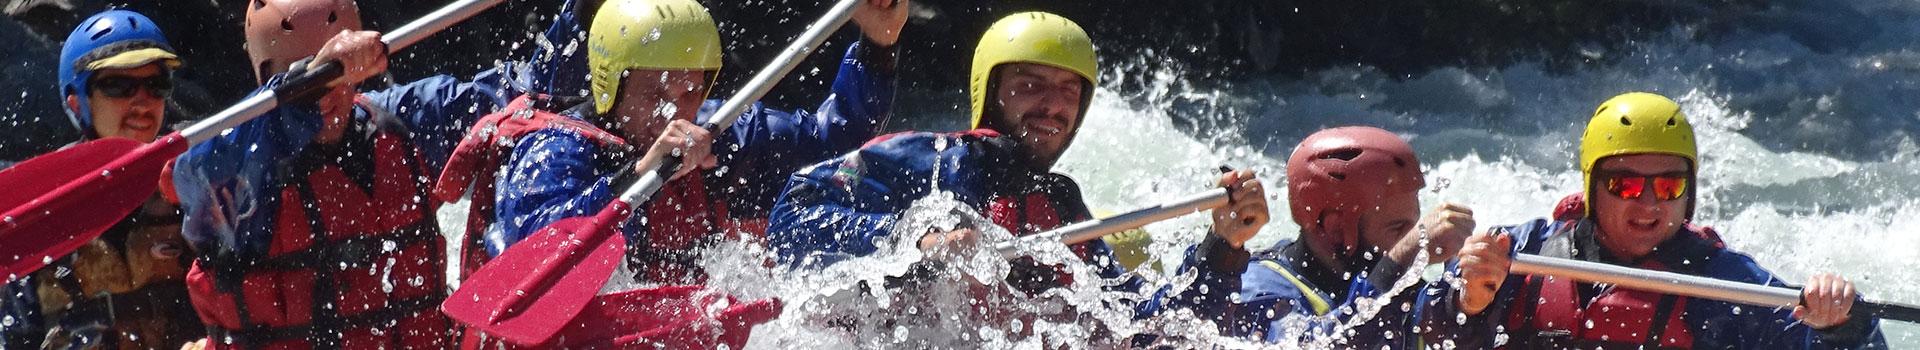 rafting Val d' Aosta